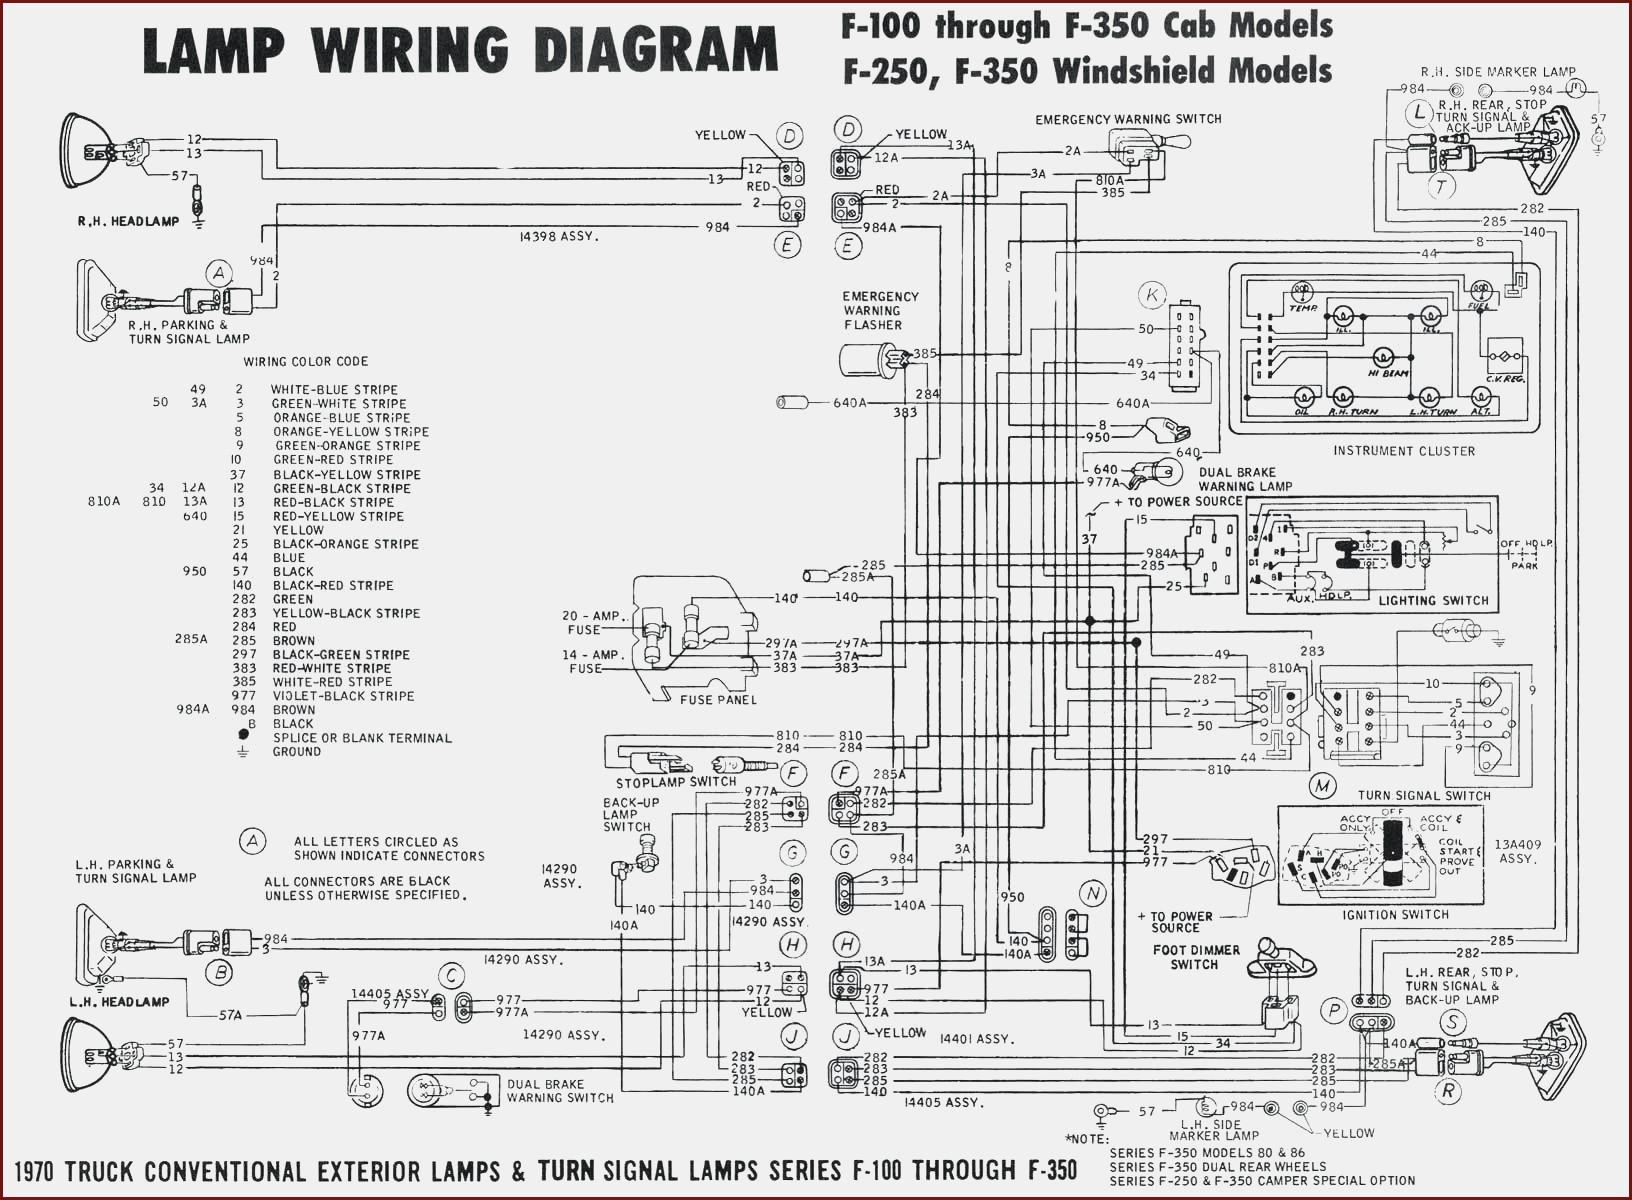 Brake and Turn Signal Wiring Diagram Ab29d Cummins Schematics Of Brake and Turn Signal Wiring Diagram